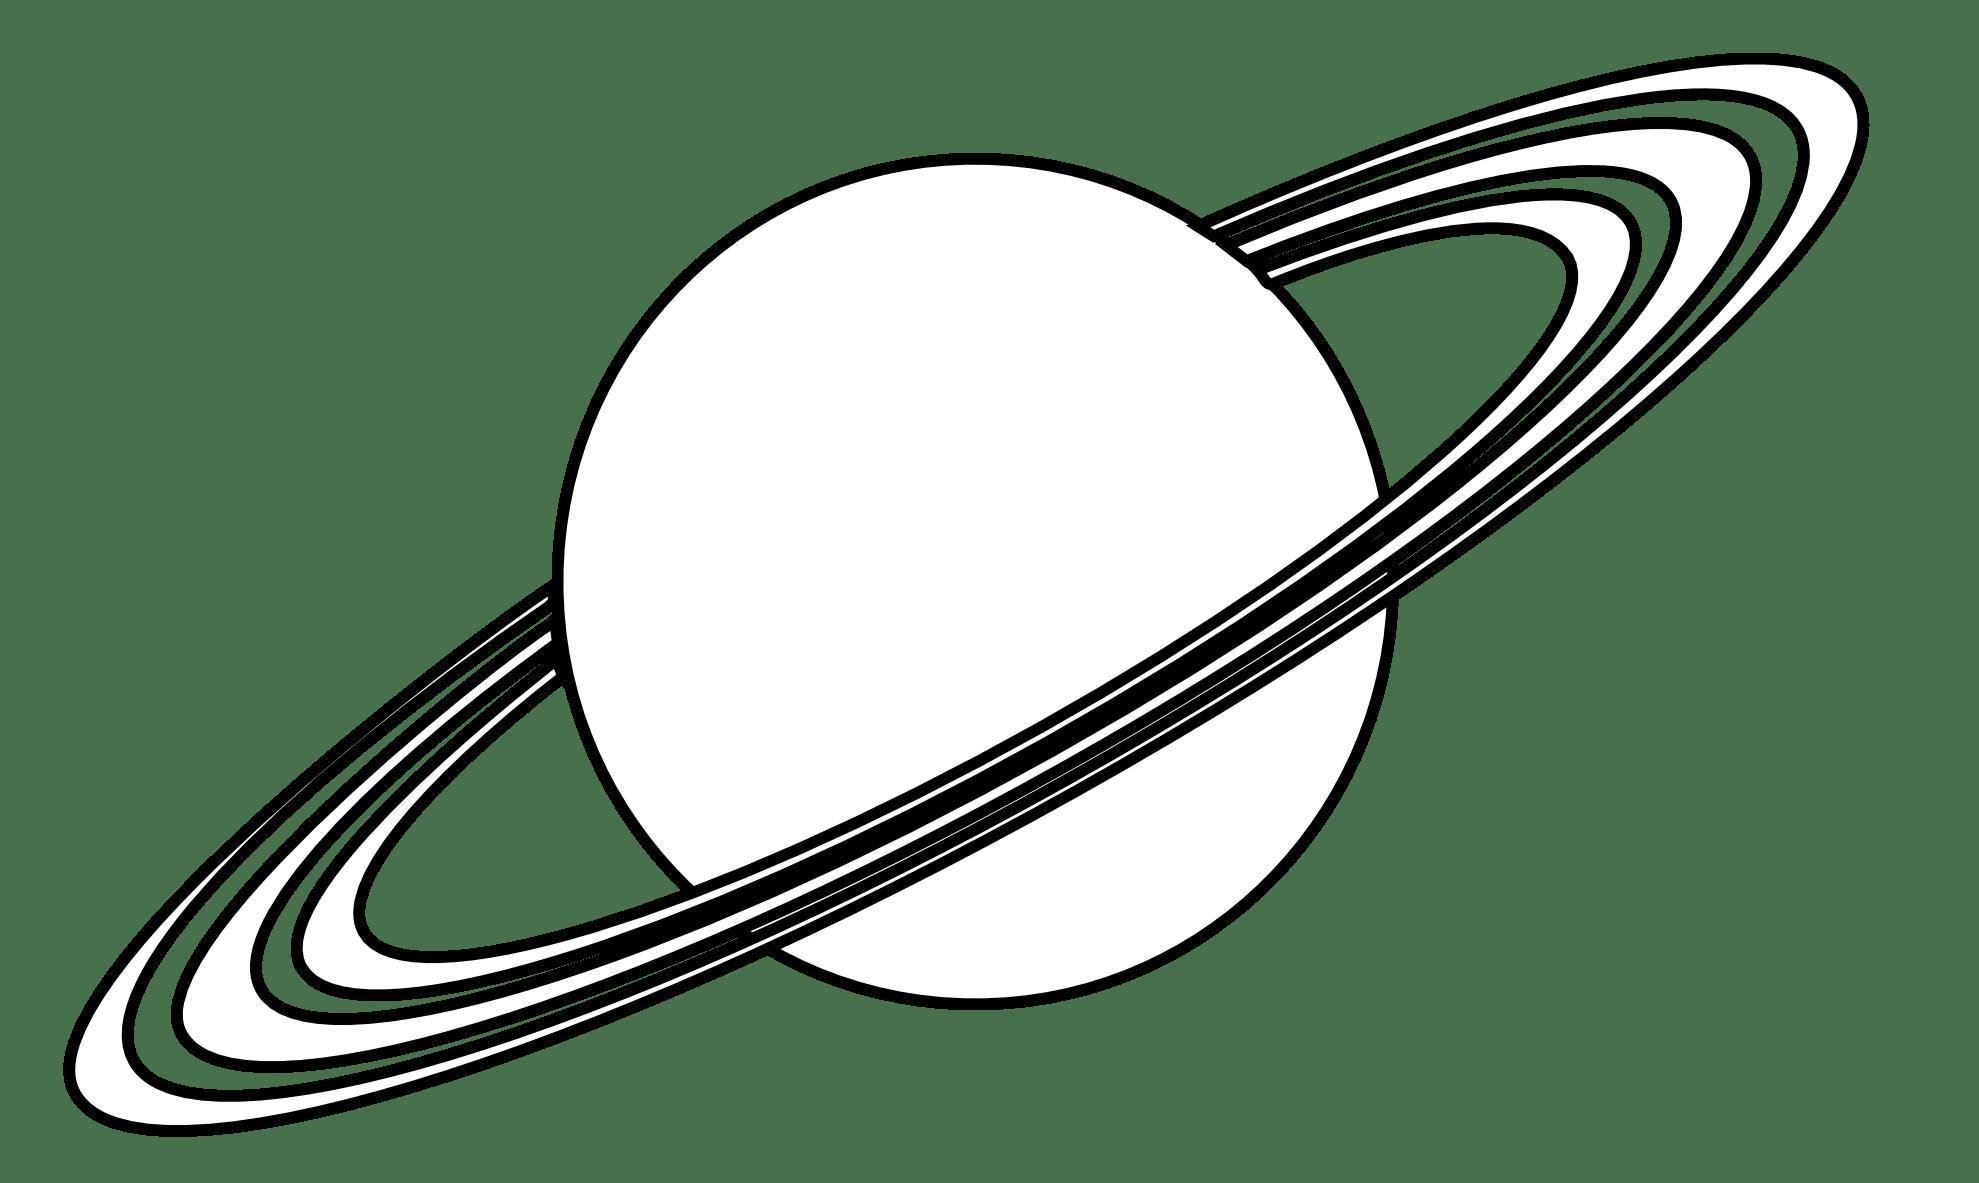 Planet Saturn Clipart